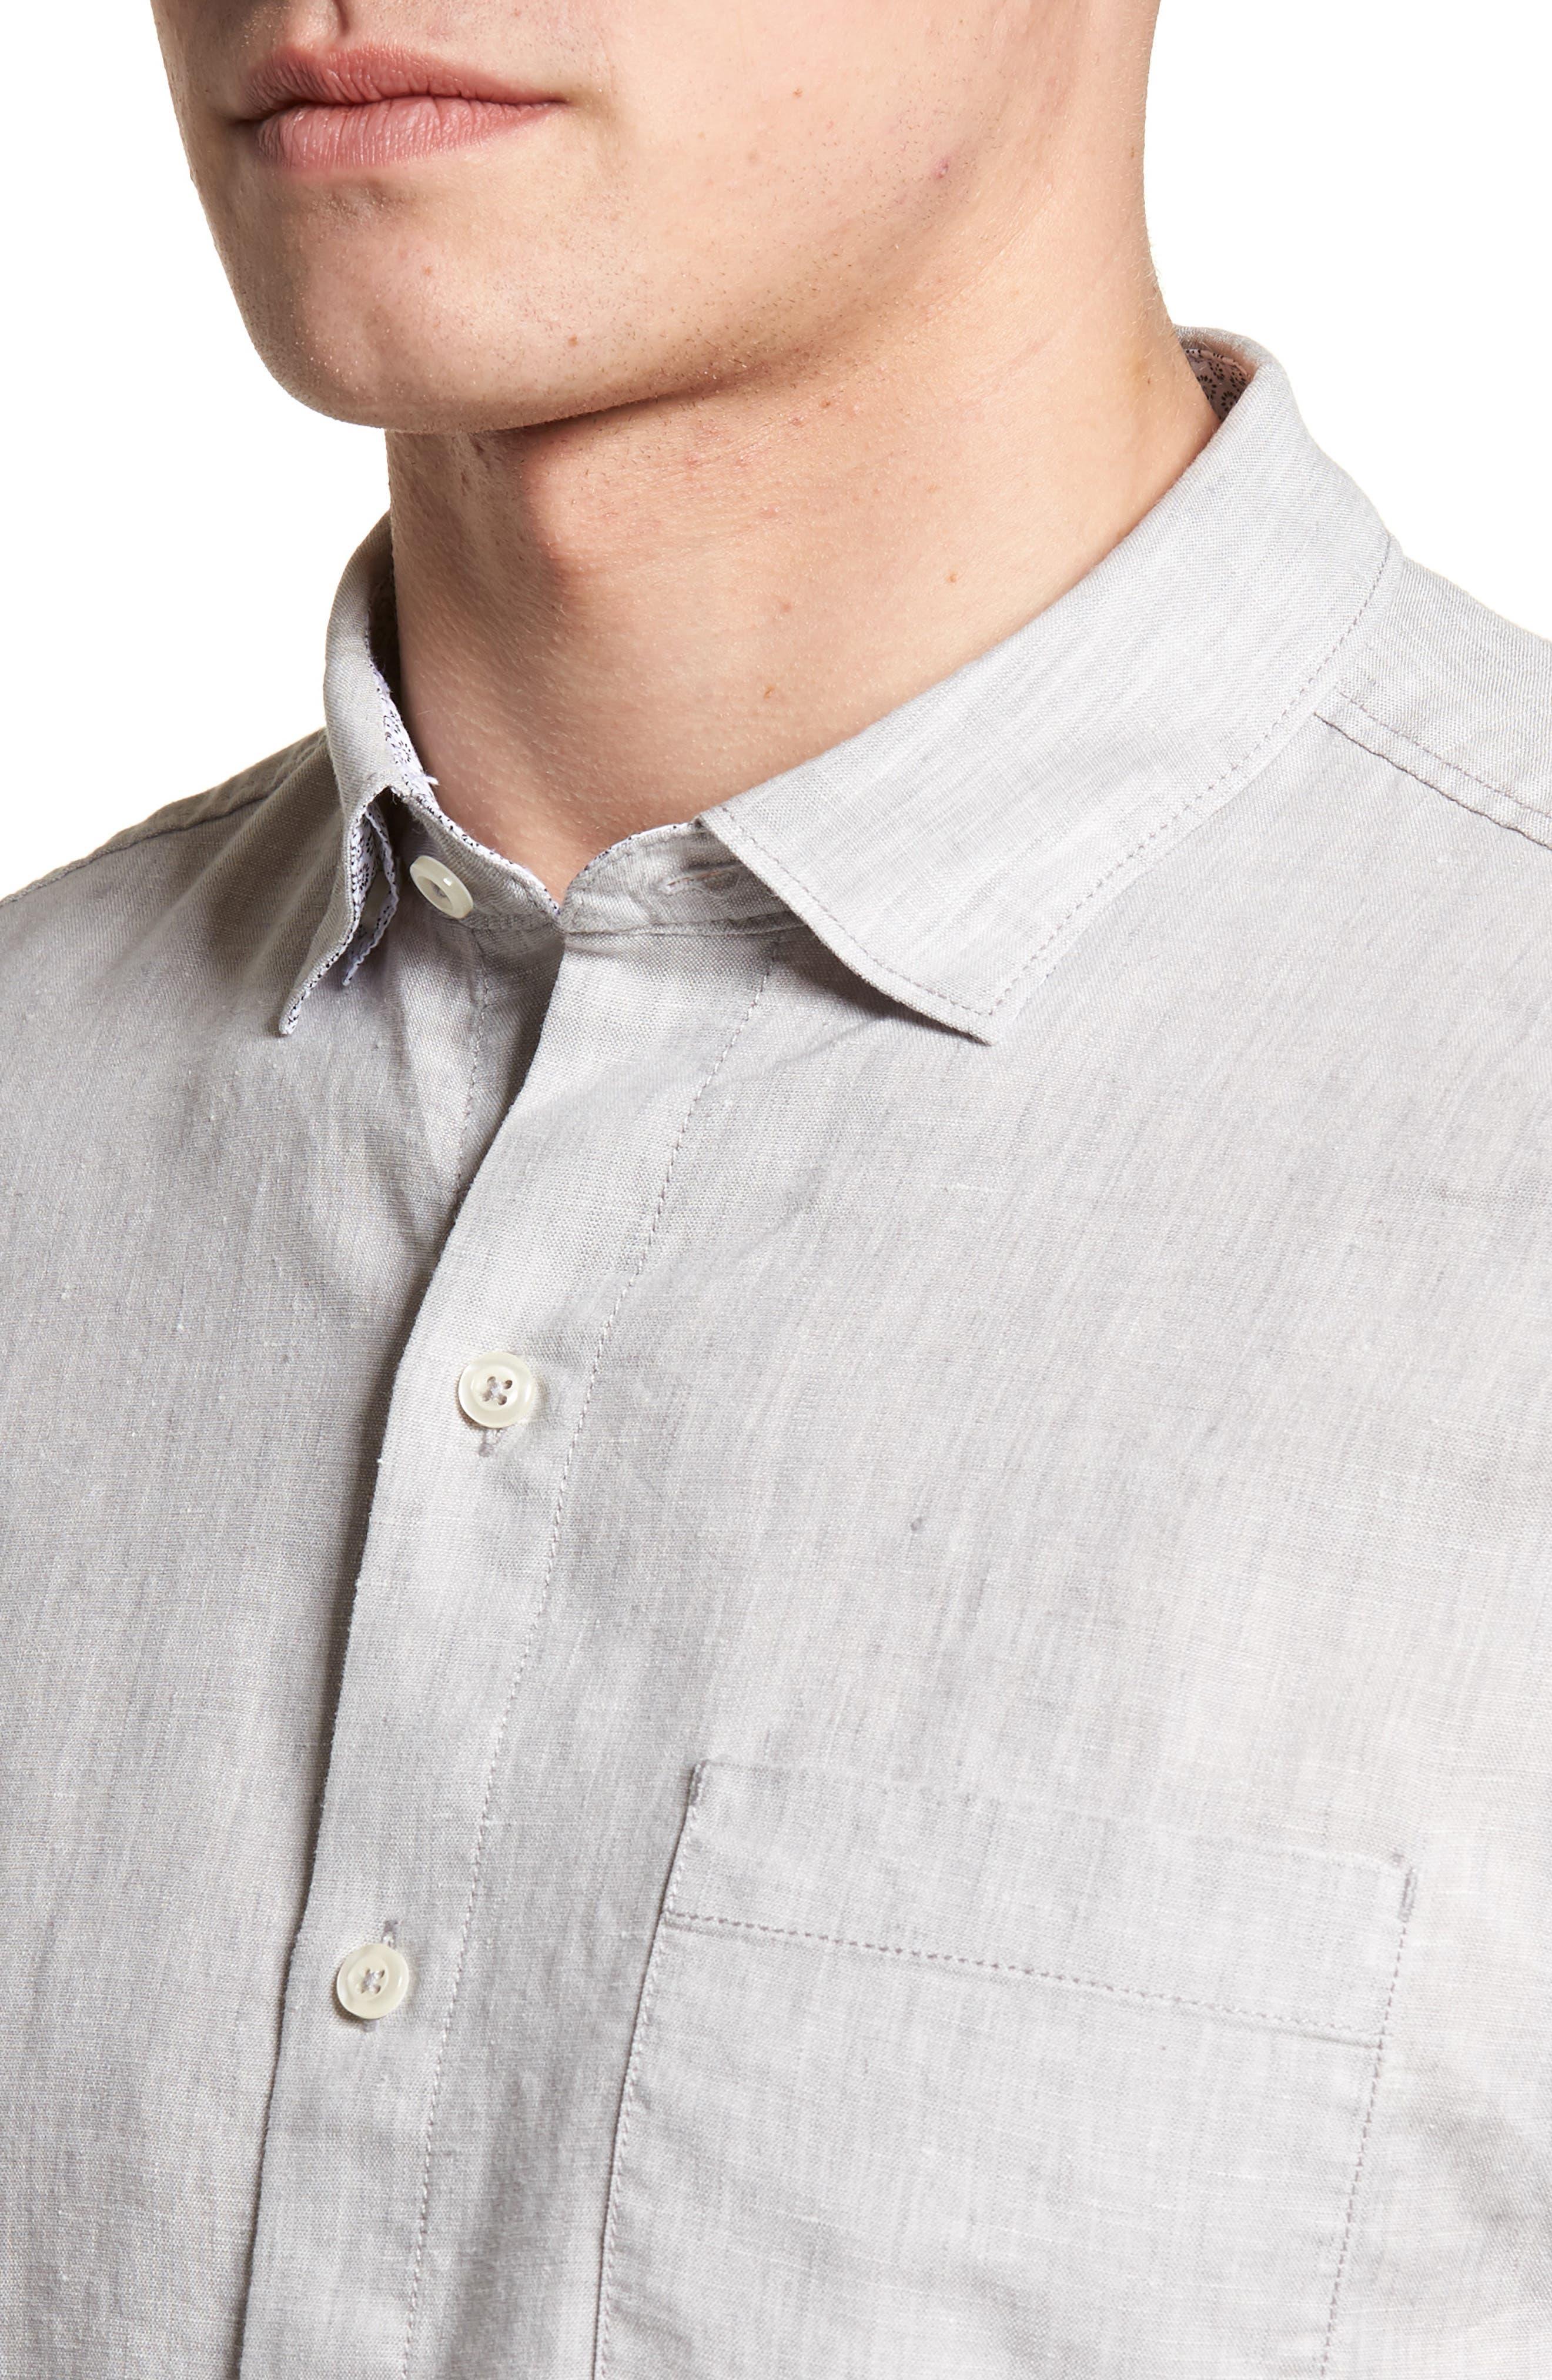 Lanai Tides Linen Blend Sport Shirt,                             Alternate thumbnail 4, color,                             020